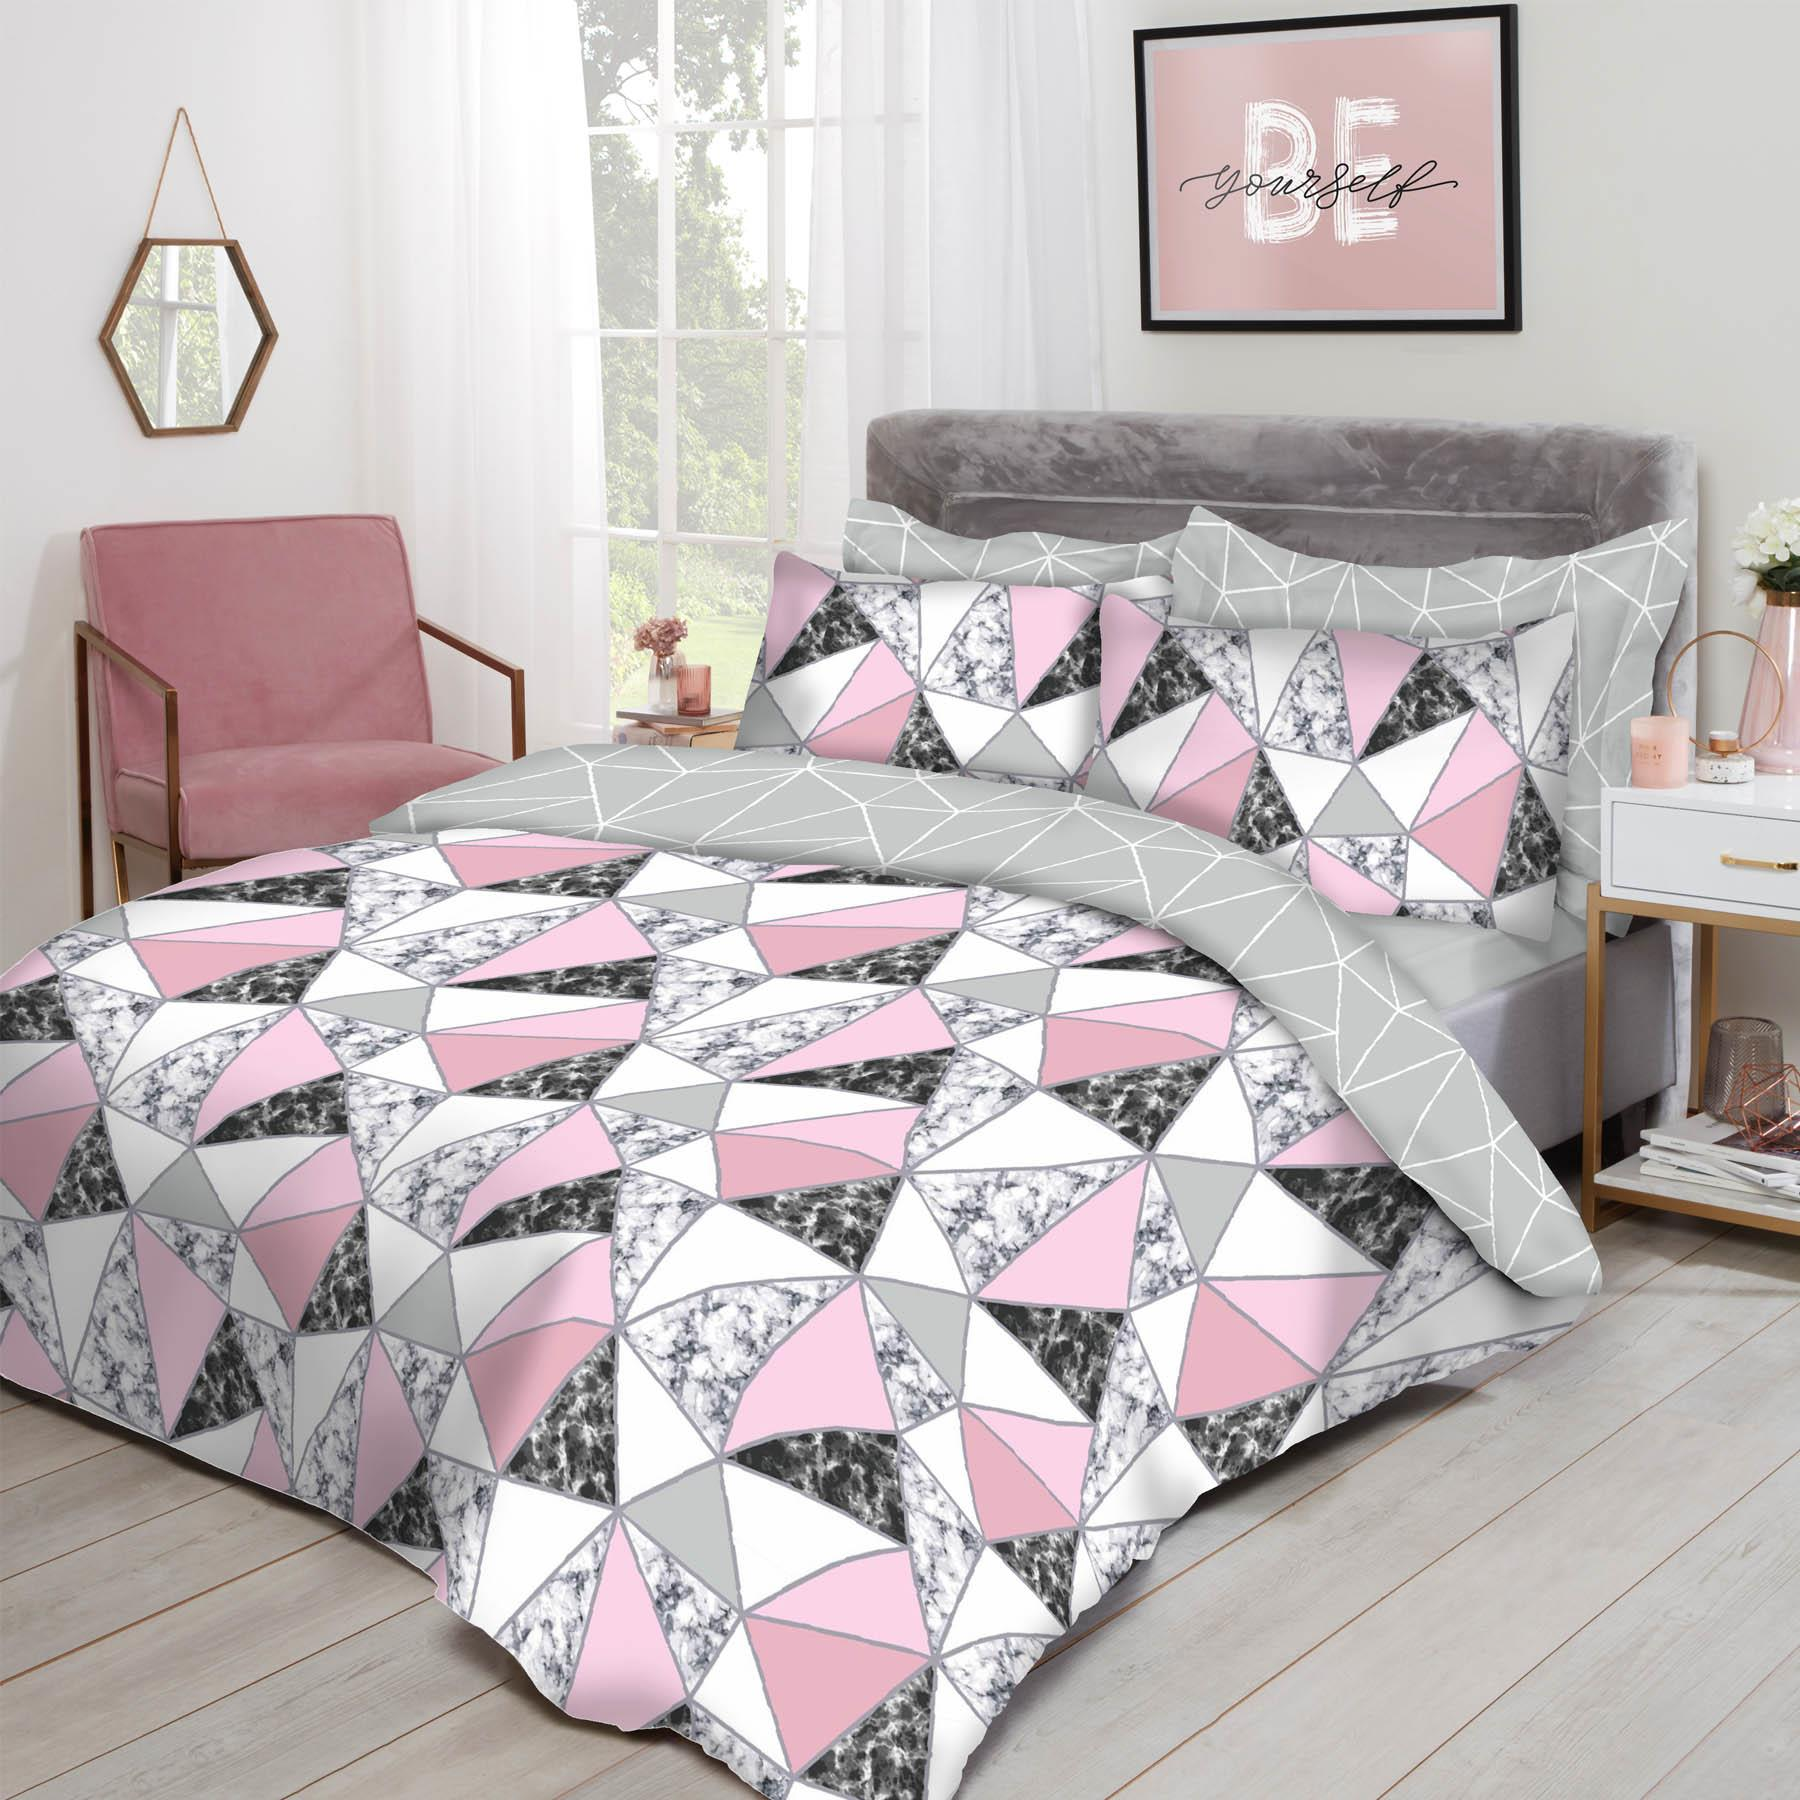 thumbnail 7 - Dreamscene Marble Geometric Duvet Cover with Pillowcase Bedding Set Grey Blush